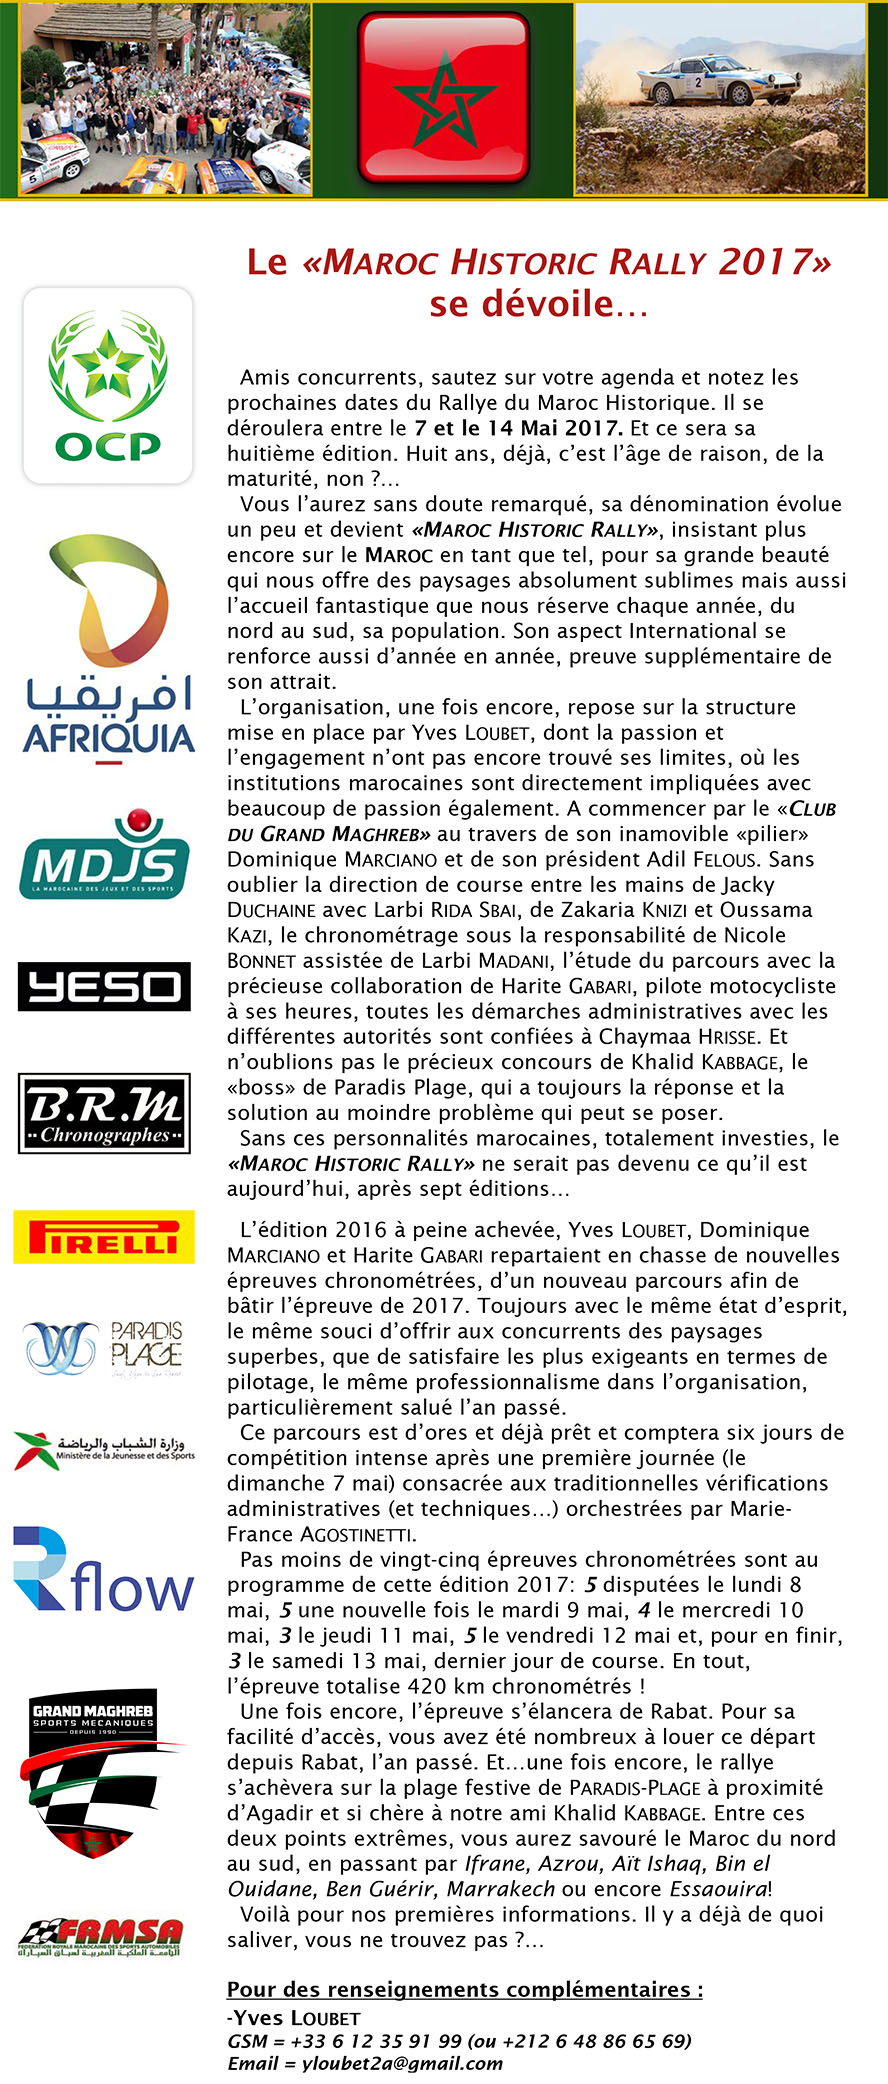 "INFO #1 : Le ""Maroc Historic Rally 2017"" se dévoile..."